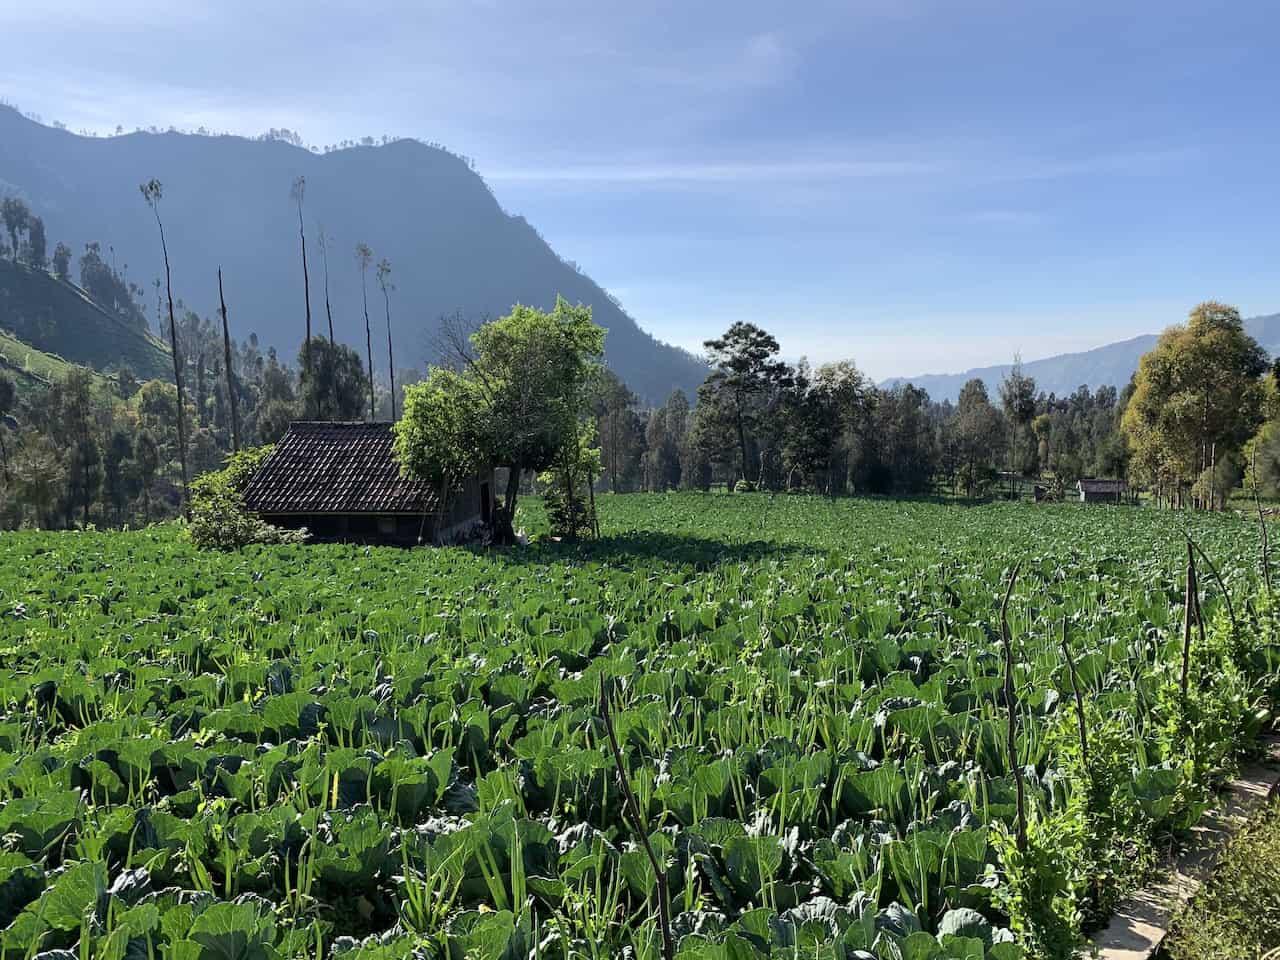 Cemoro Lawang Farms